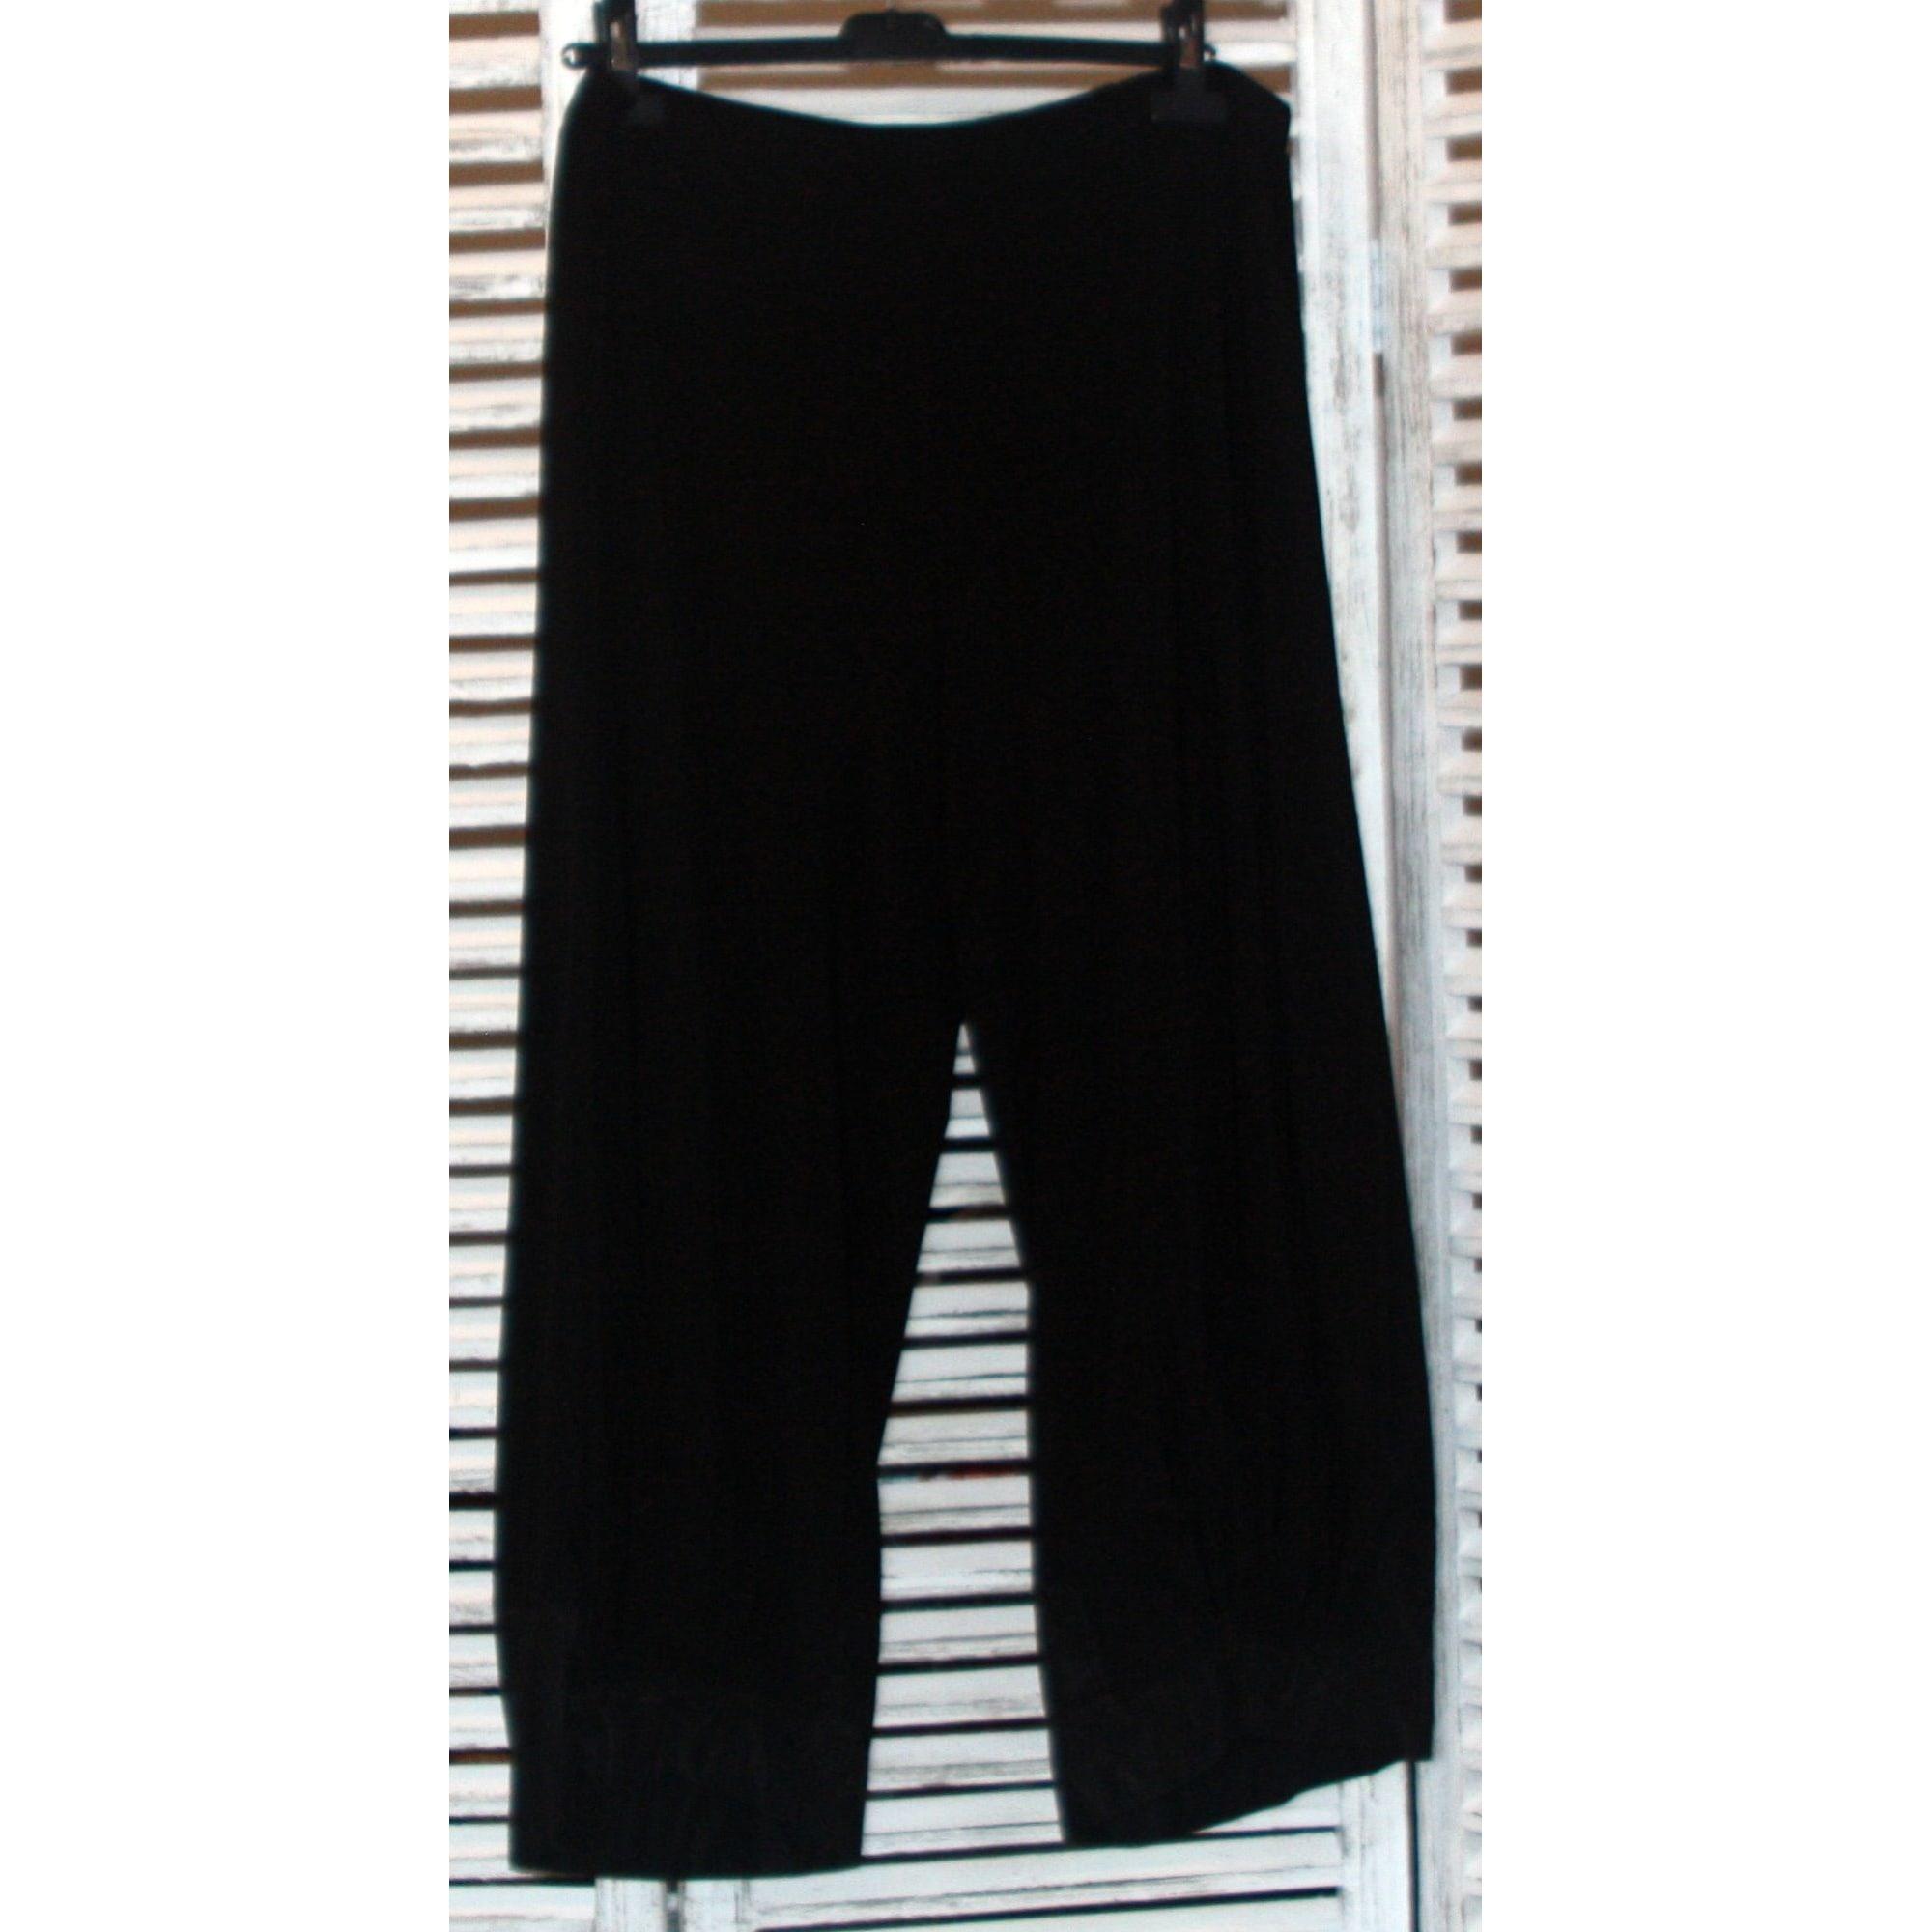 Pantalon large ALAIN WEIZ Noir